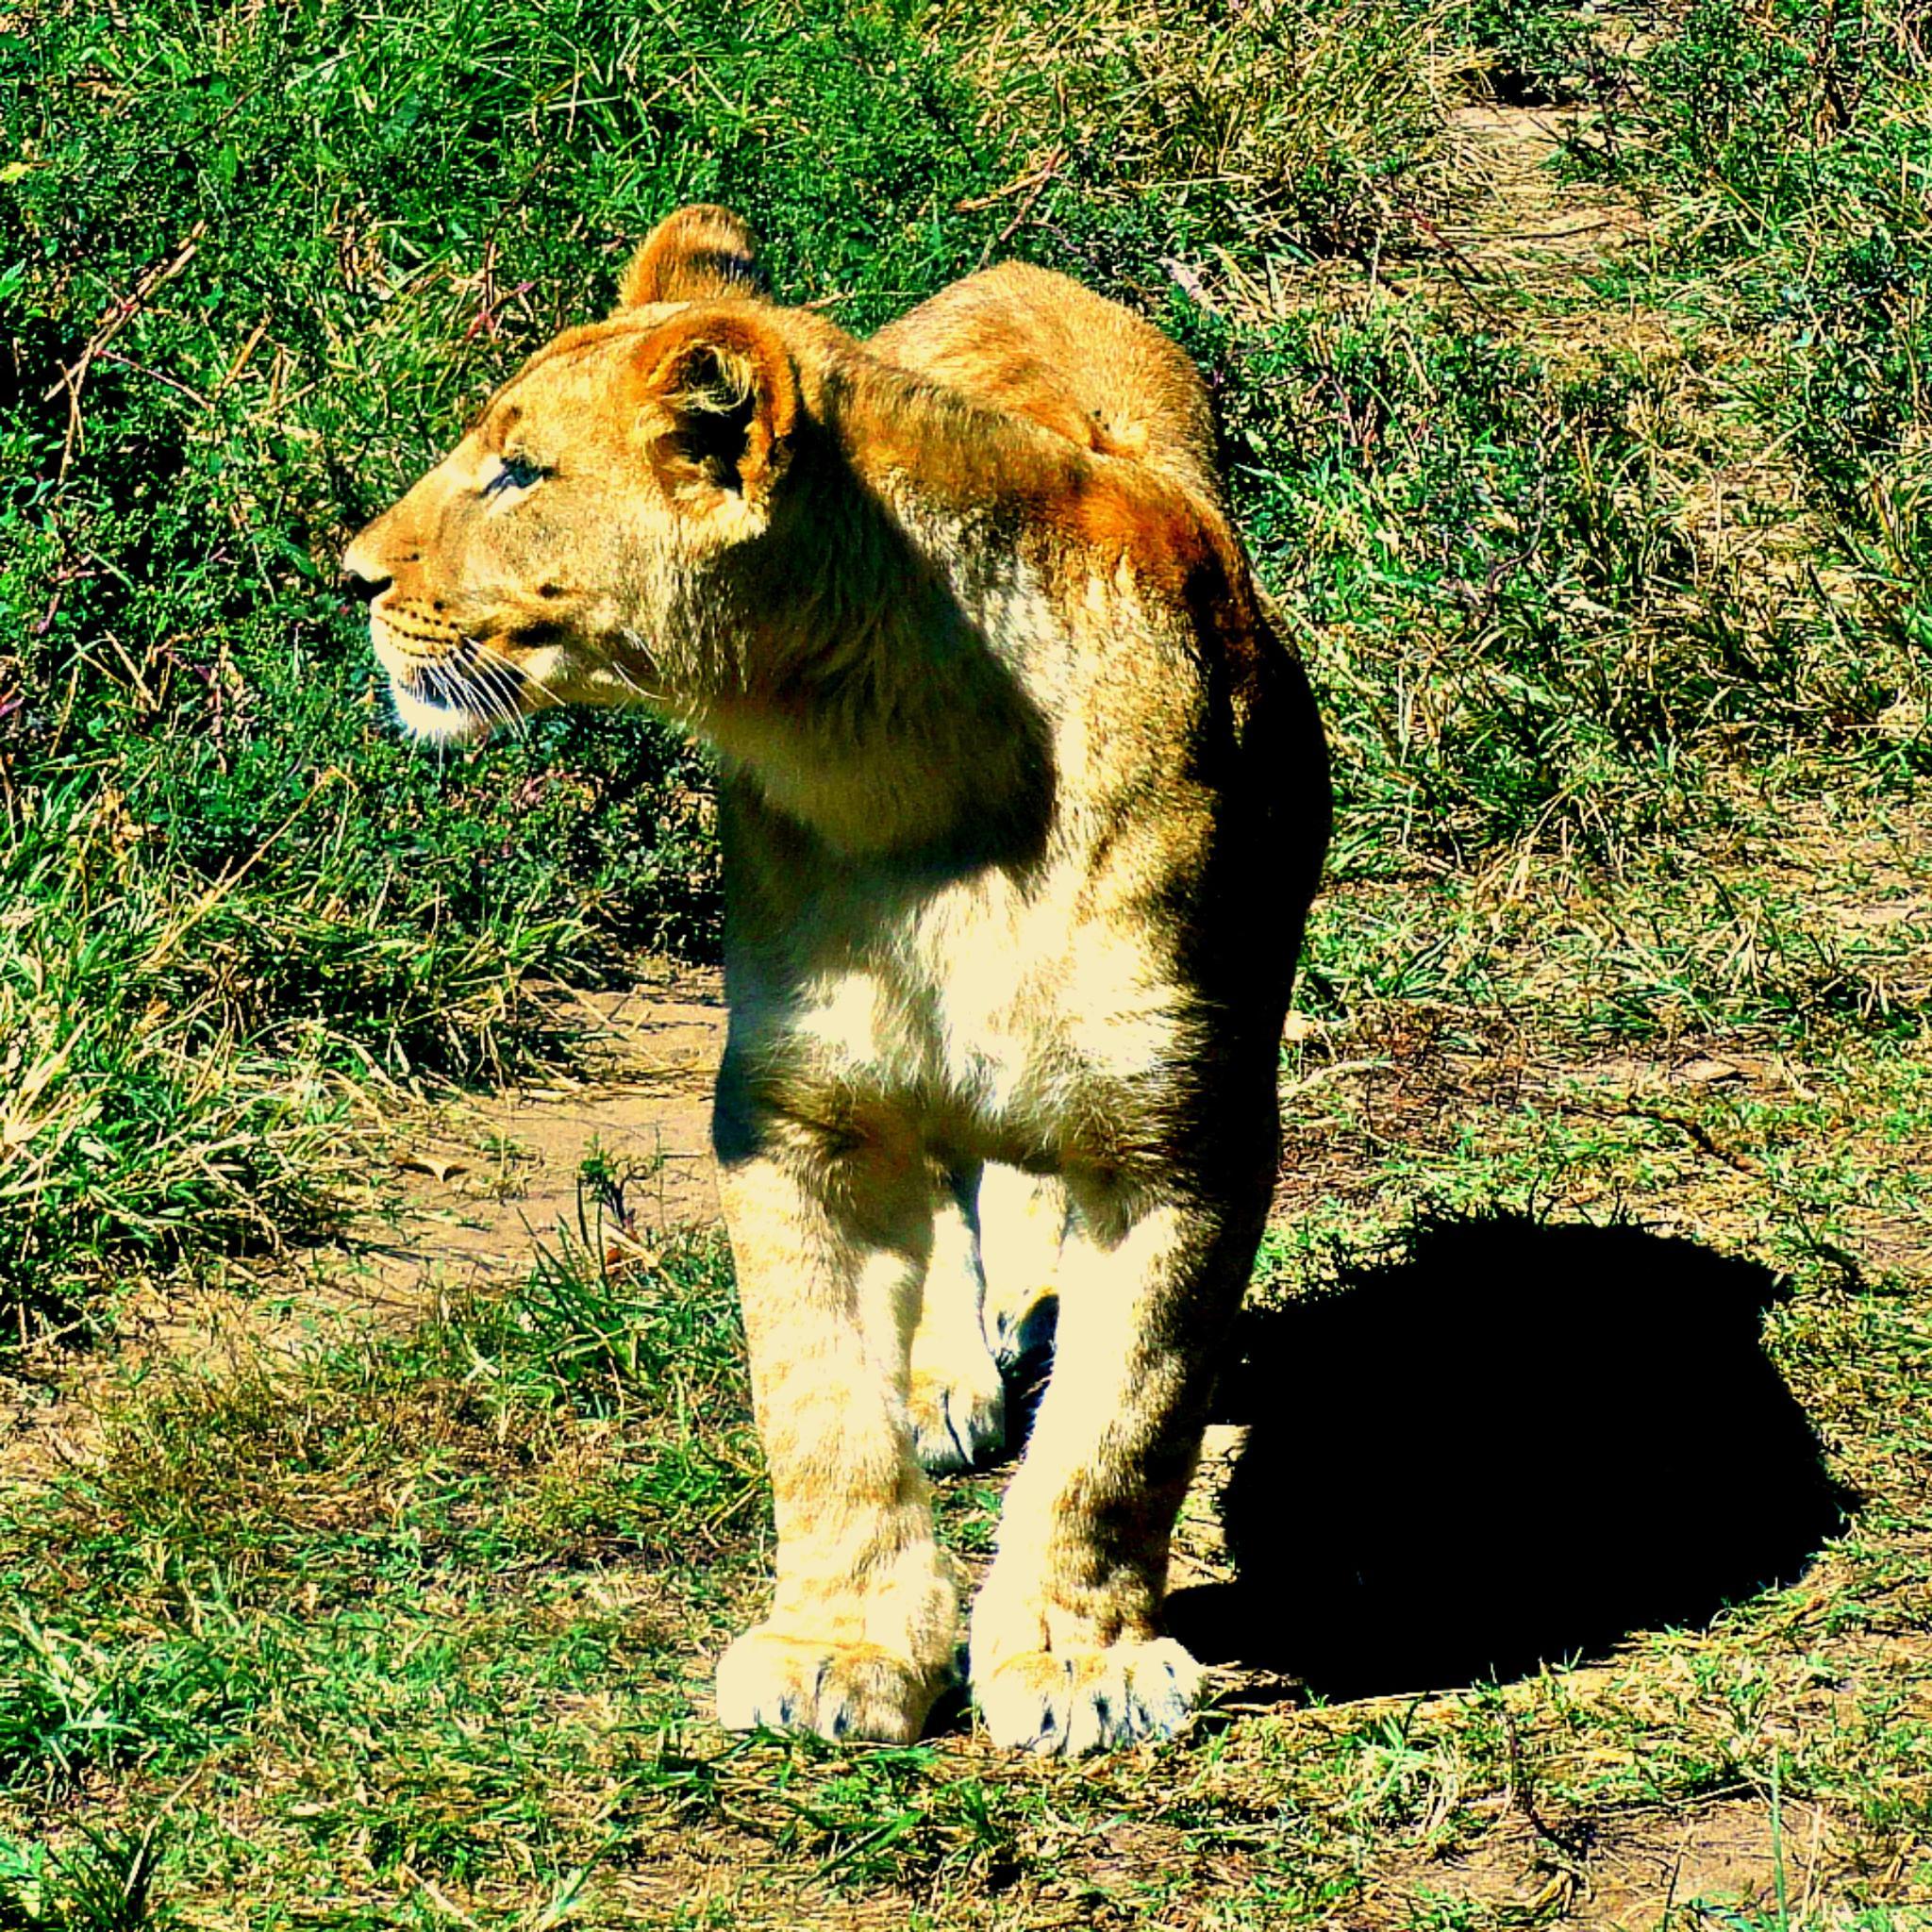 Lioness by Lione'sLens